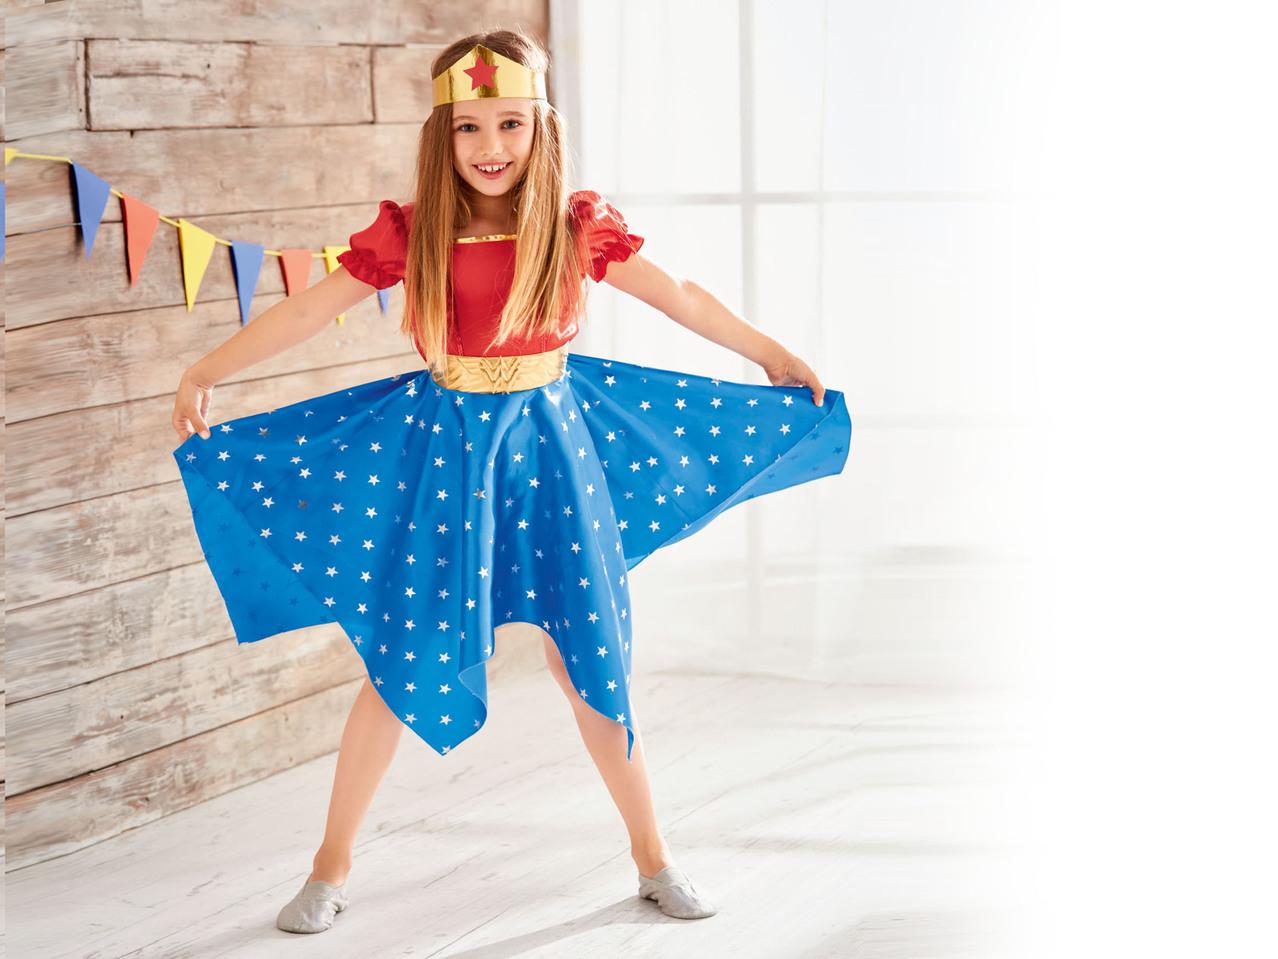 Costumi Halloween 2019 Lidl.Girls Carnival Costume Batgirl Wonderwoman Supergirl Lidl